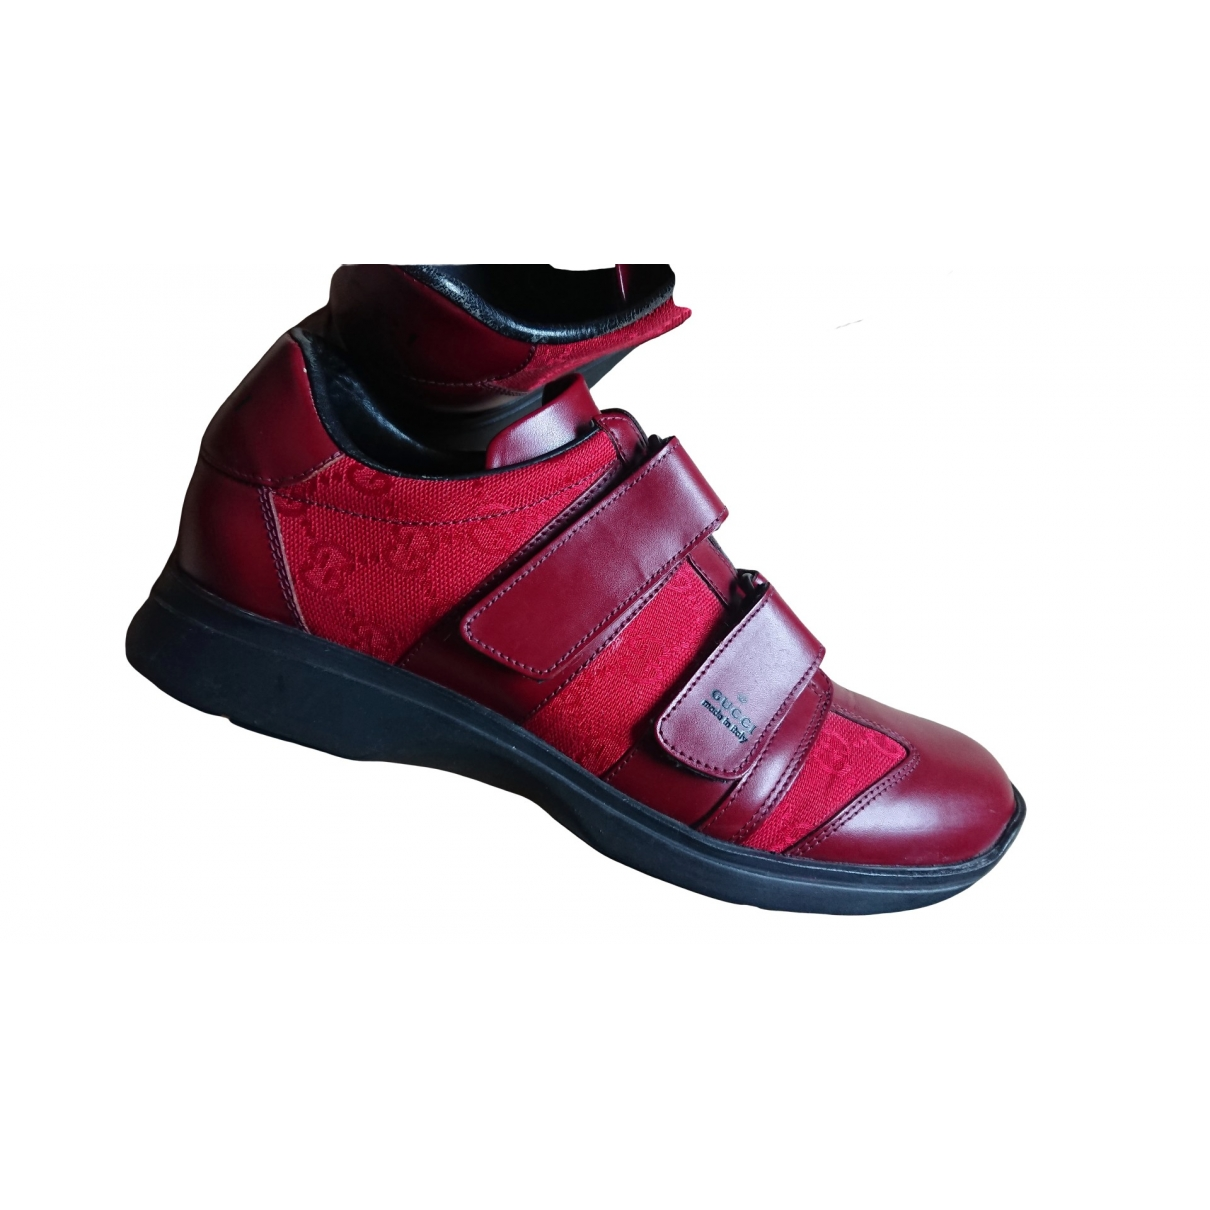 Gucci \N Burgundy Leather Trainers for Women 38 EU